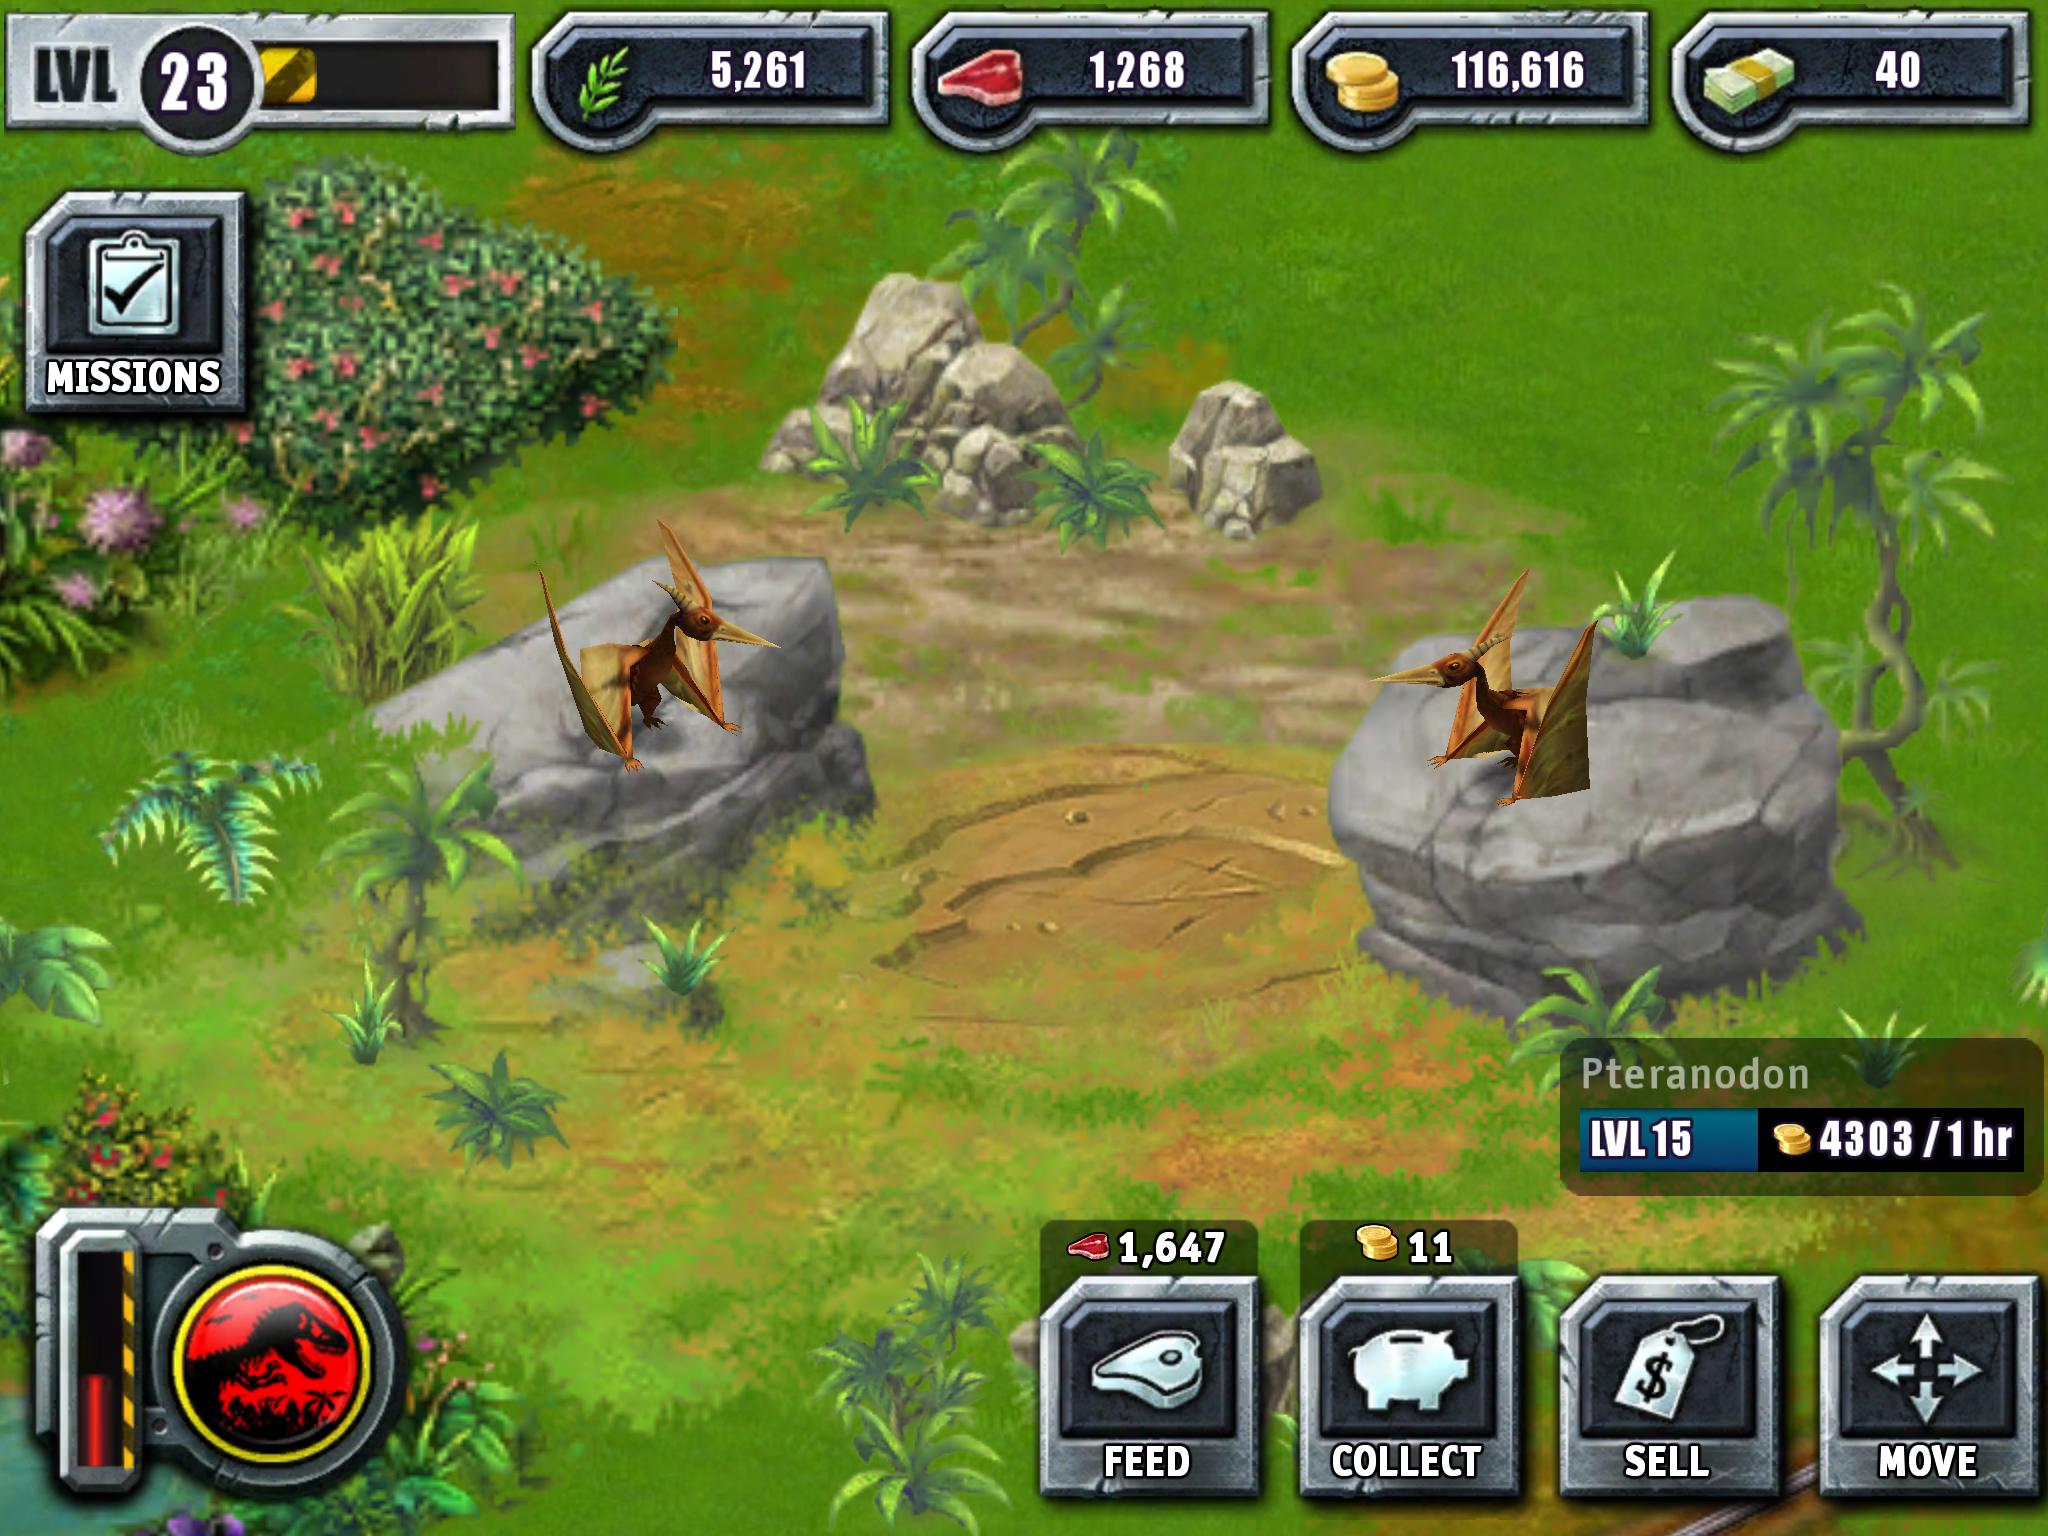 Pteranodon jurassic park builder wiki - Jurassic park builder decorations ...